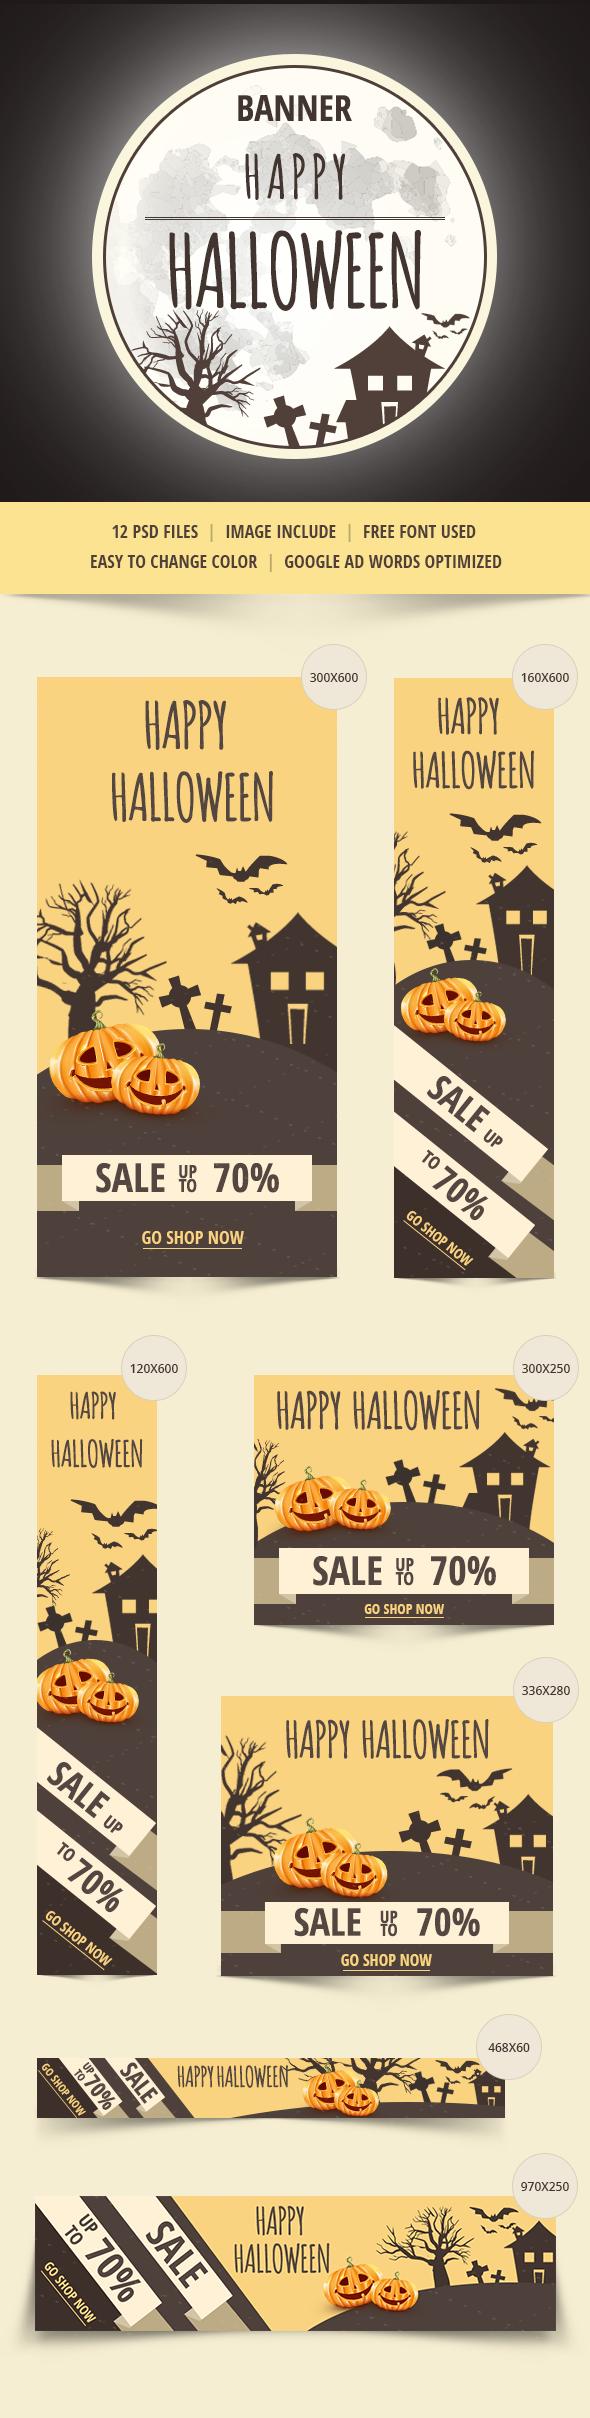 Halloween creative banner pumpkin ghosht ghost discount sale